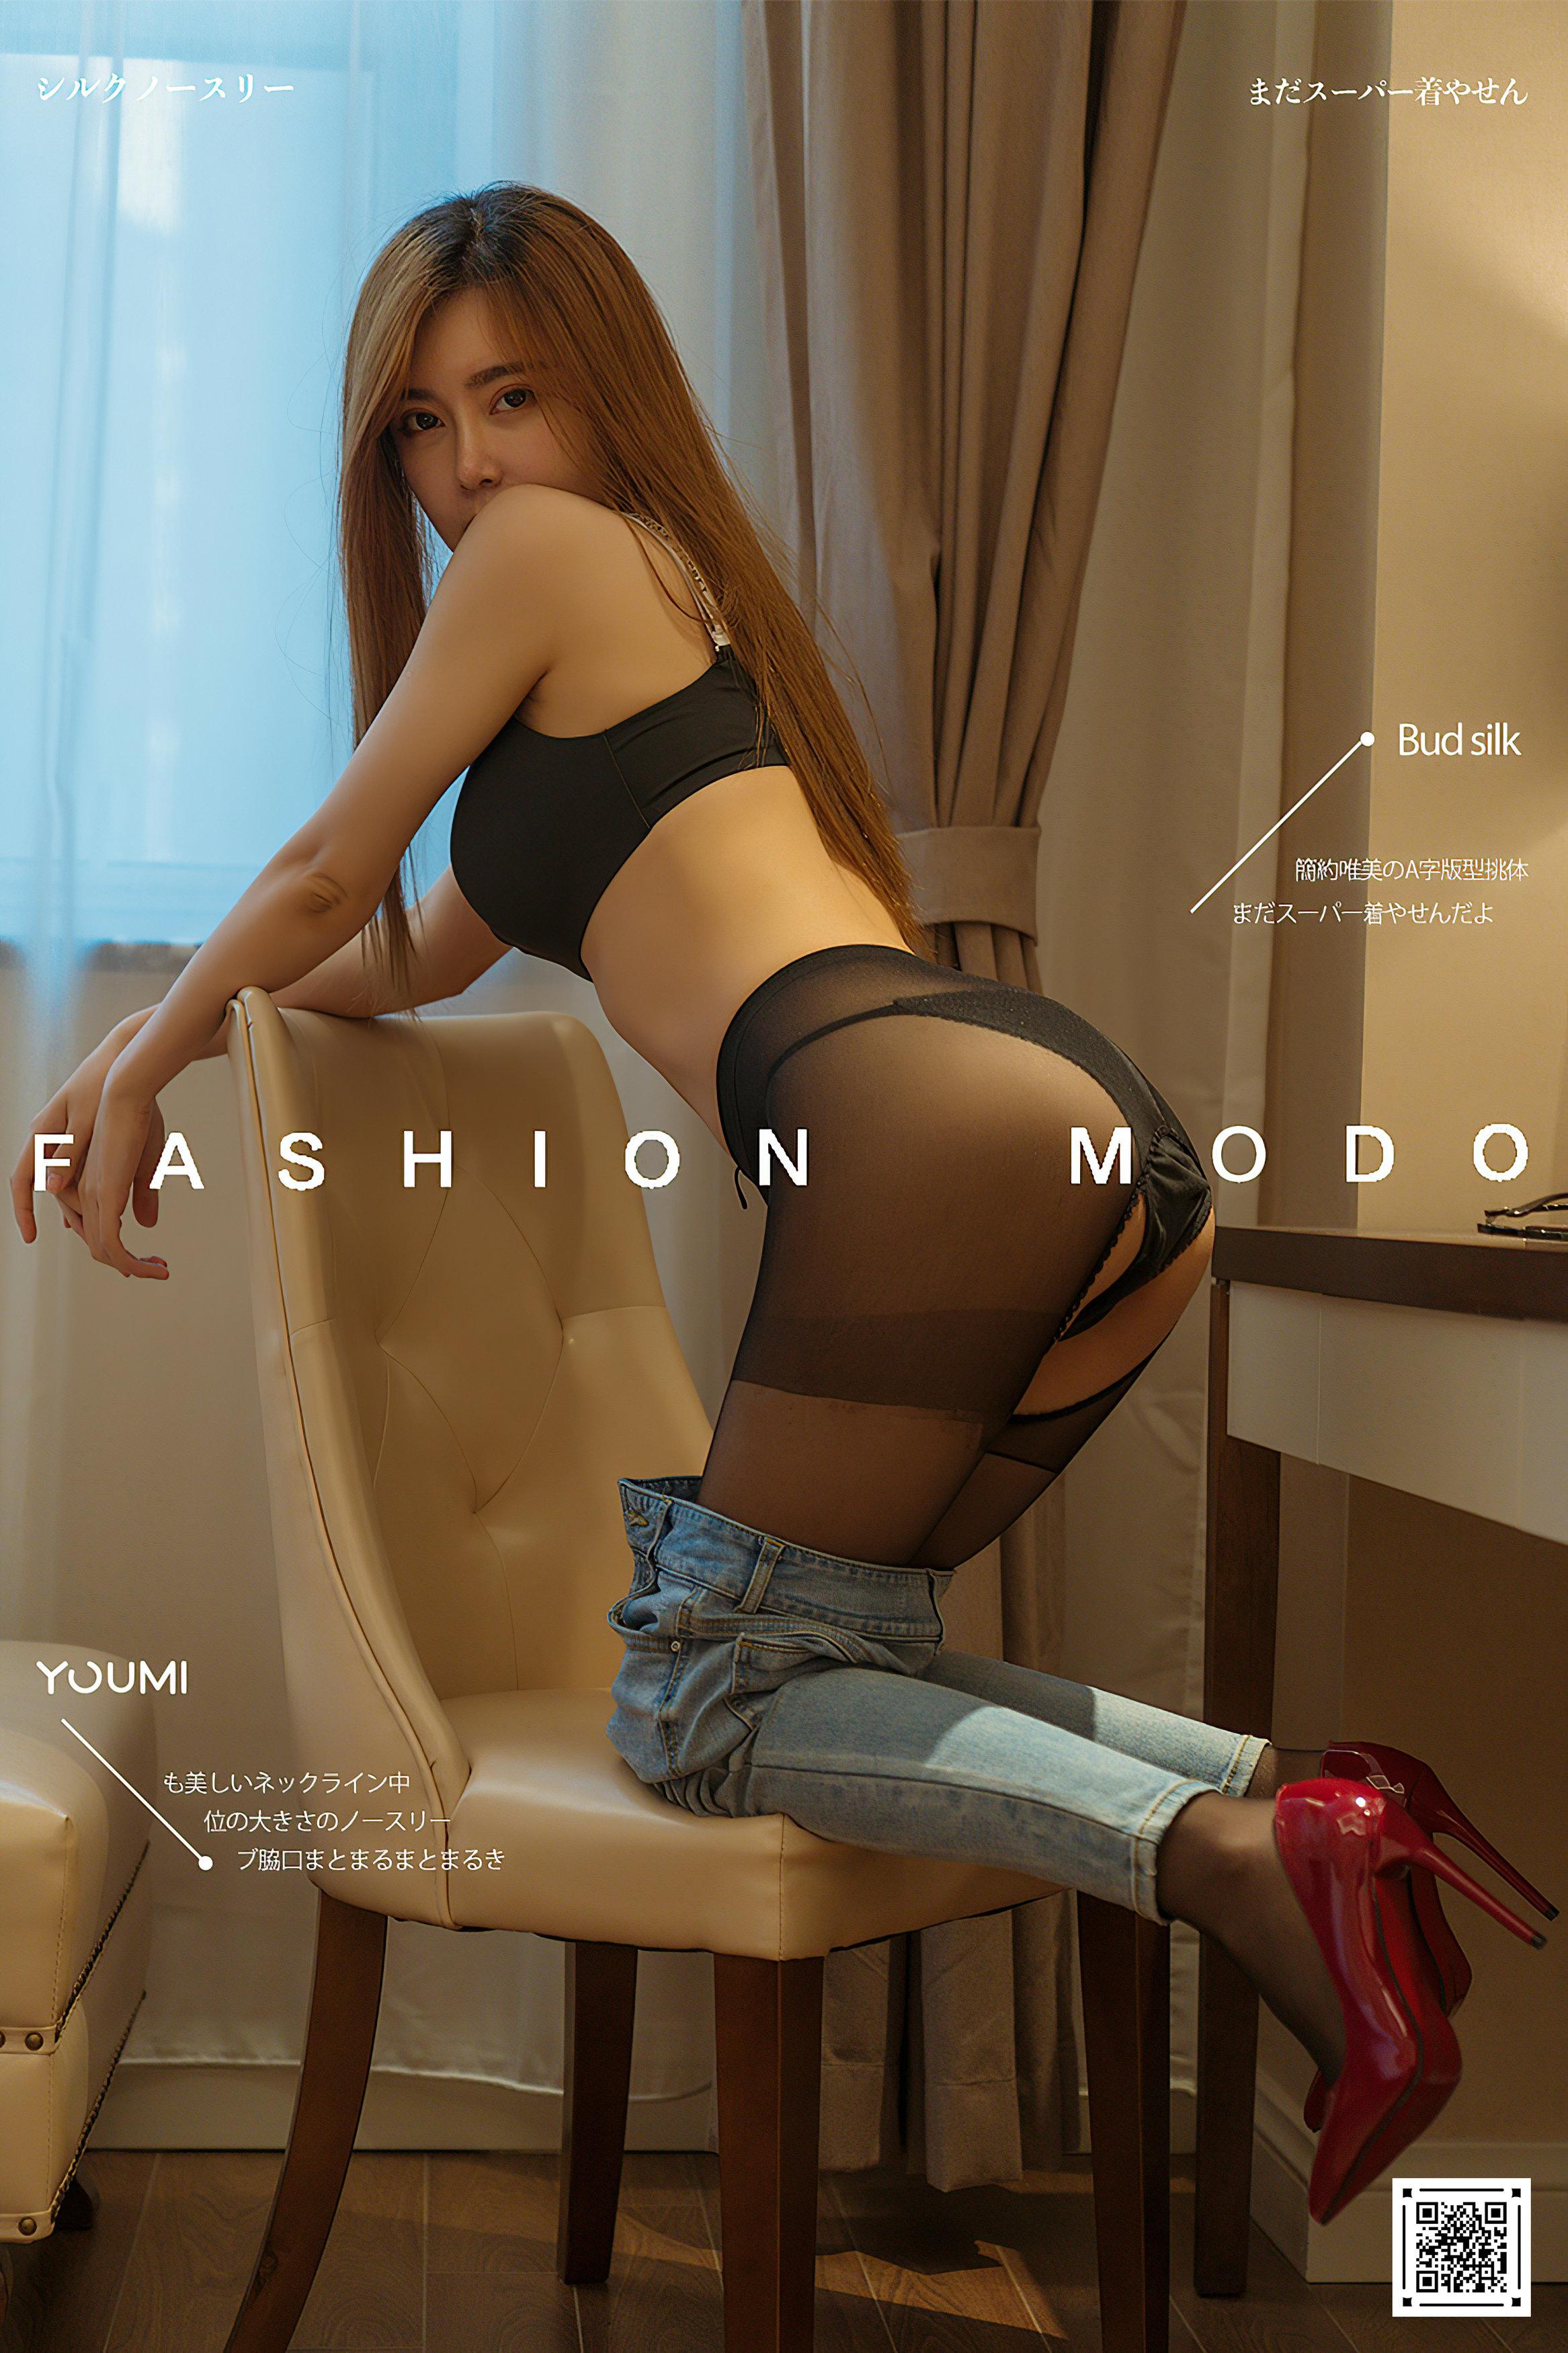 【YouMei尤蜜系列】2020.12.23 勾魂秘書 Yomi悠蜜【39P】 - 貼圖 - 絲襪美腿 -